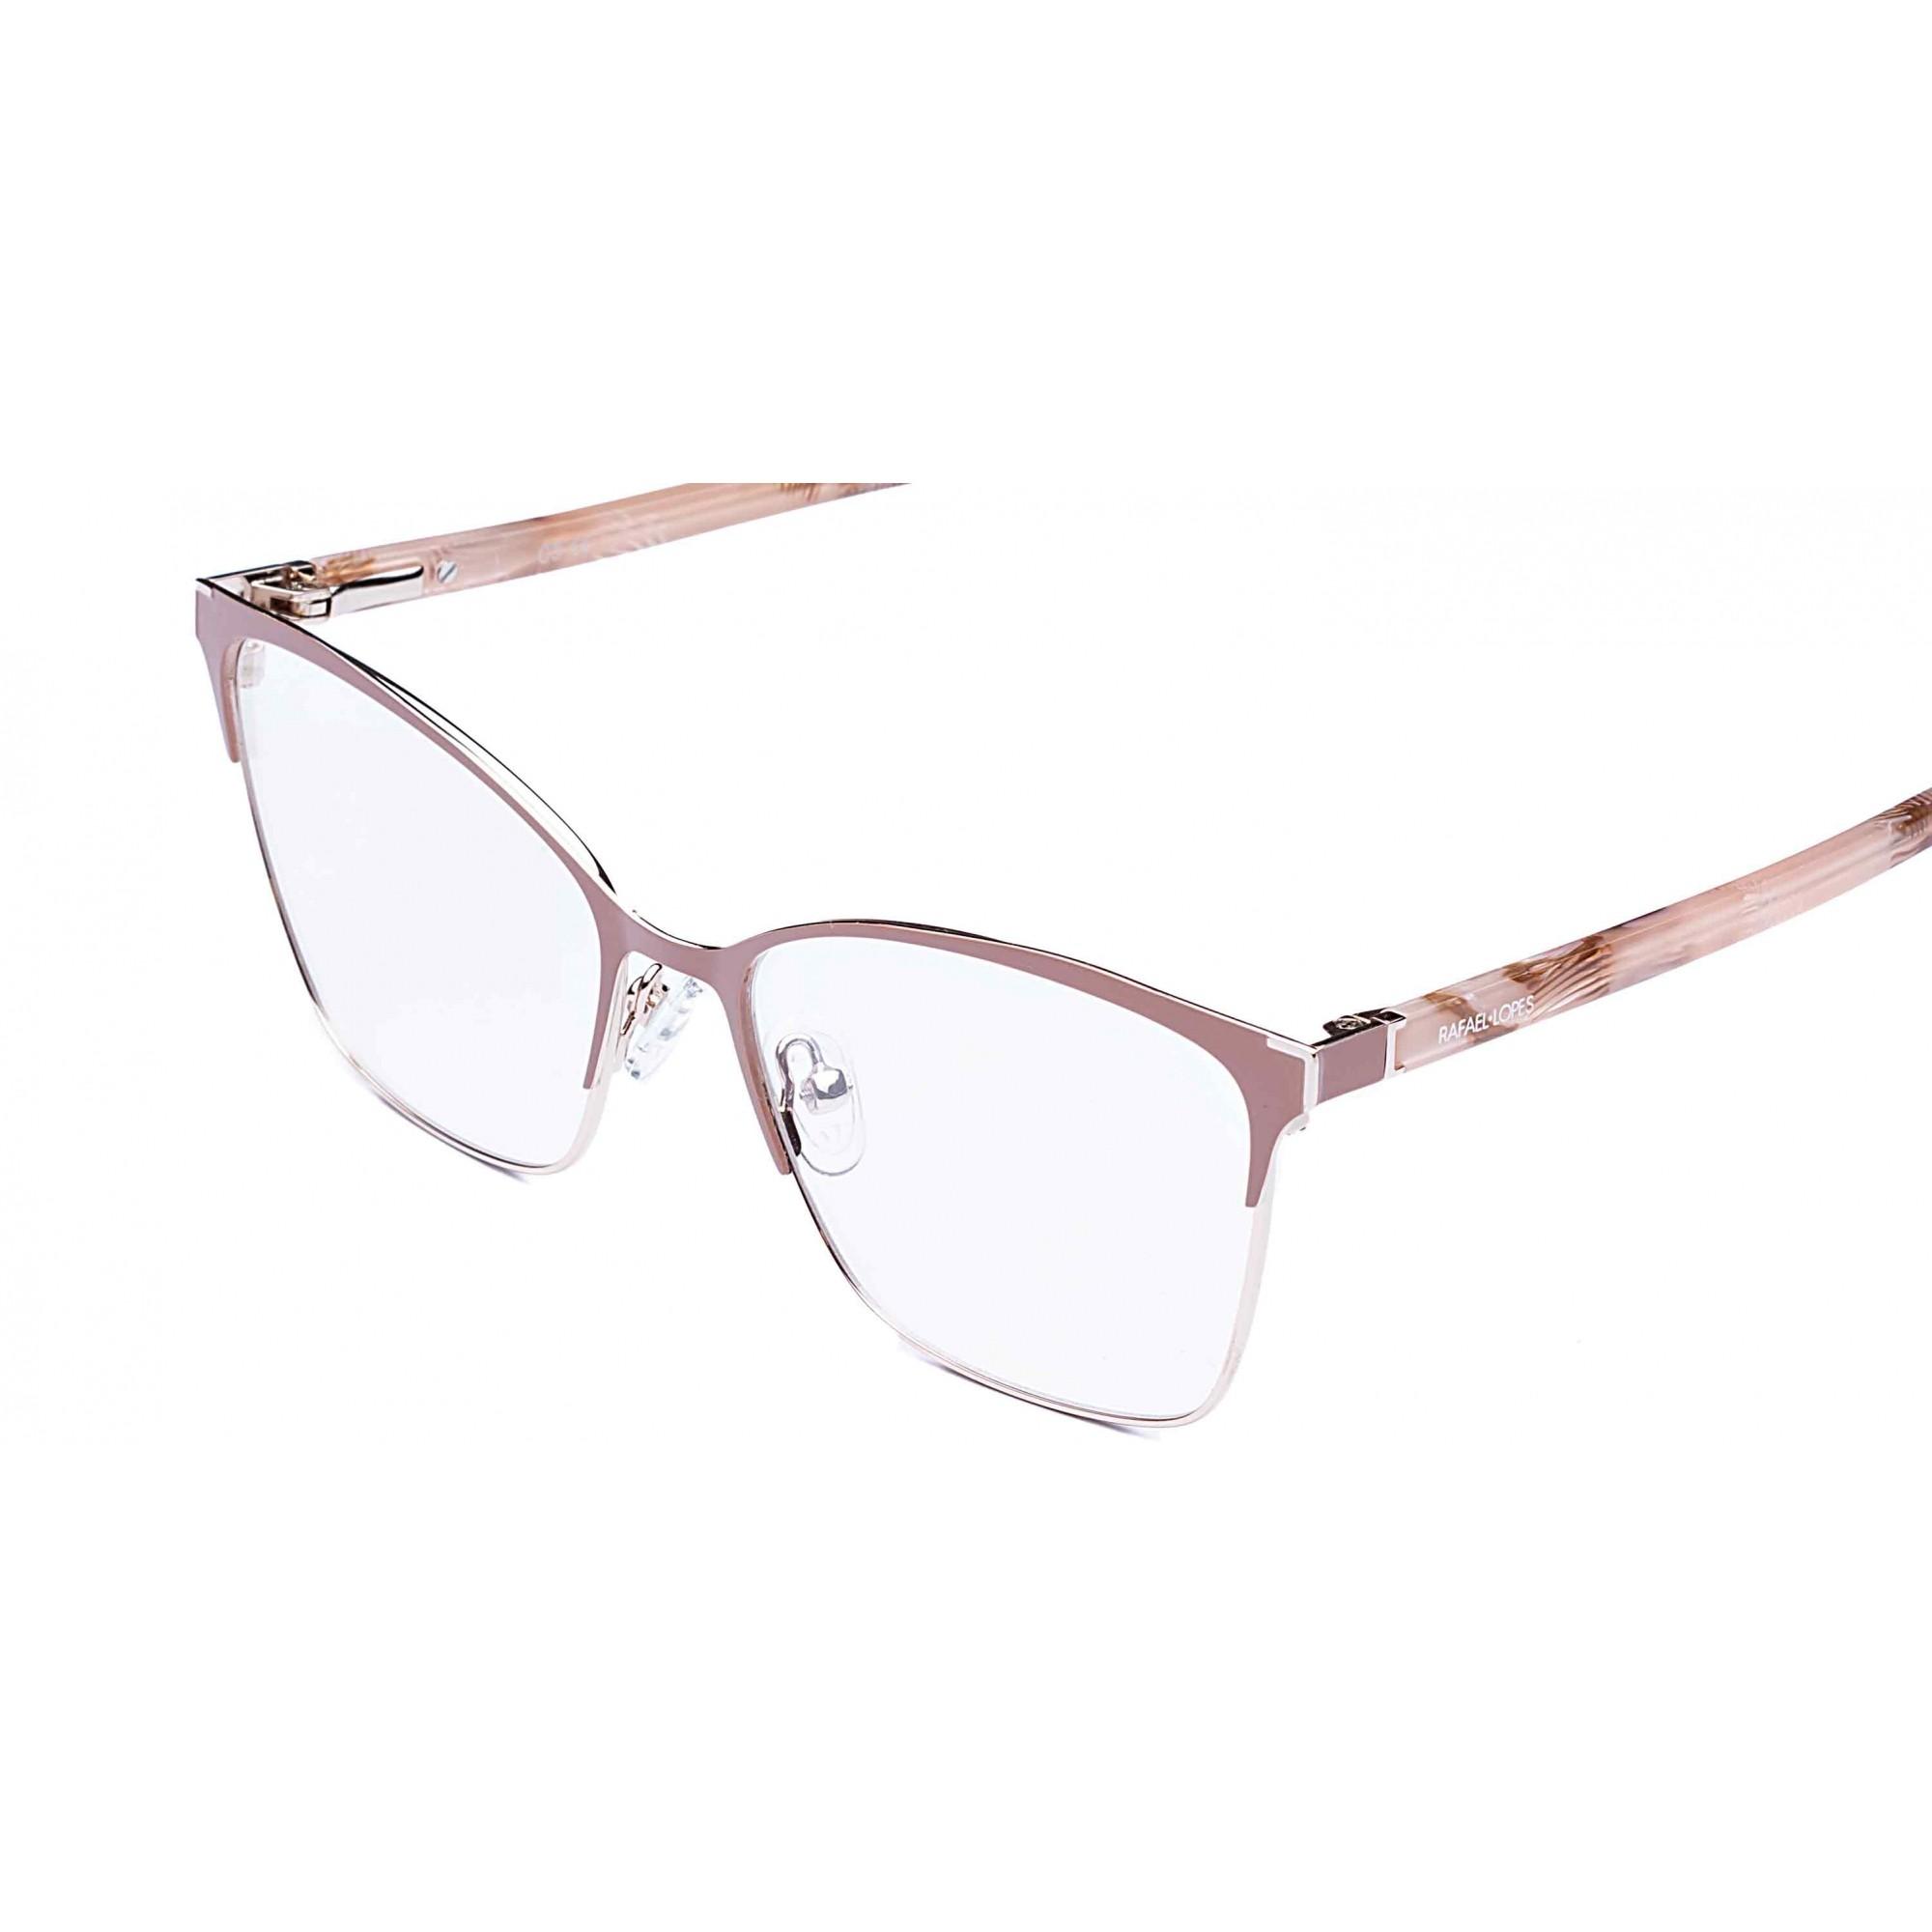 Óculos de Grau Emily Rafael Lopes